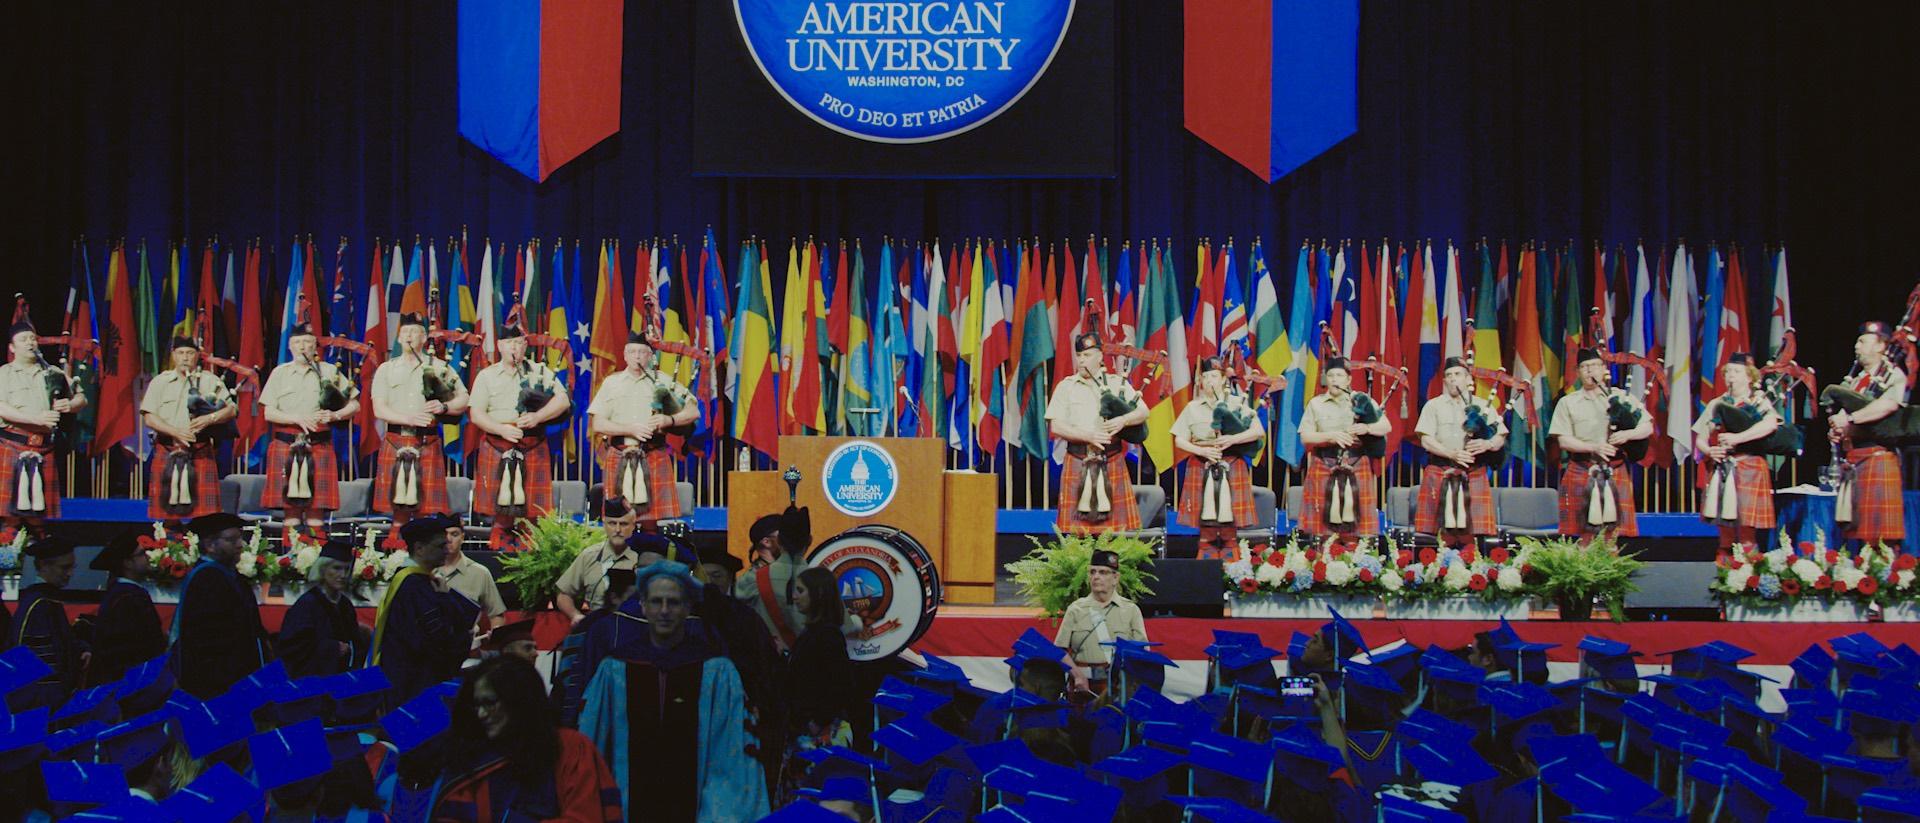 american university washington d c american university